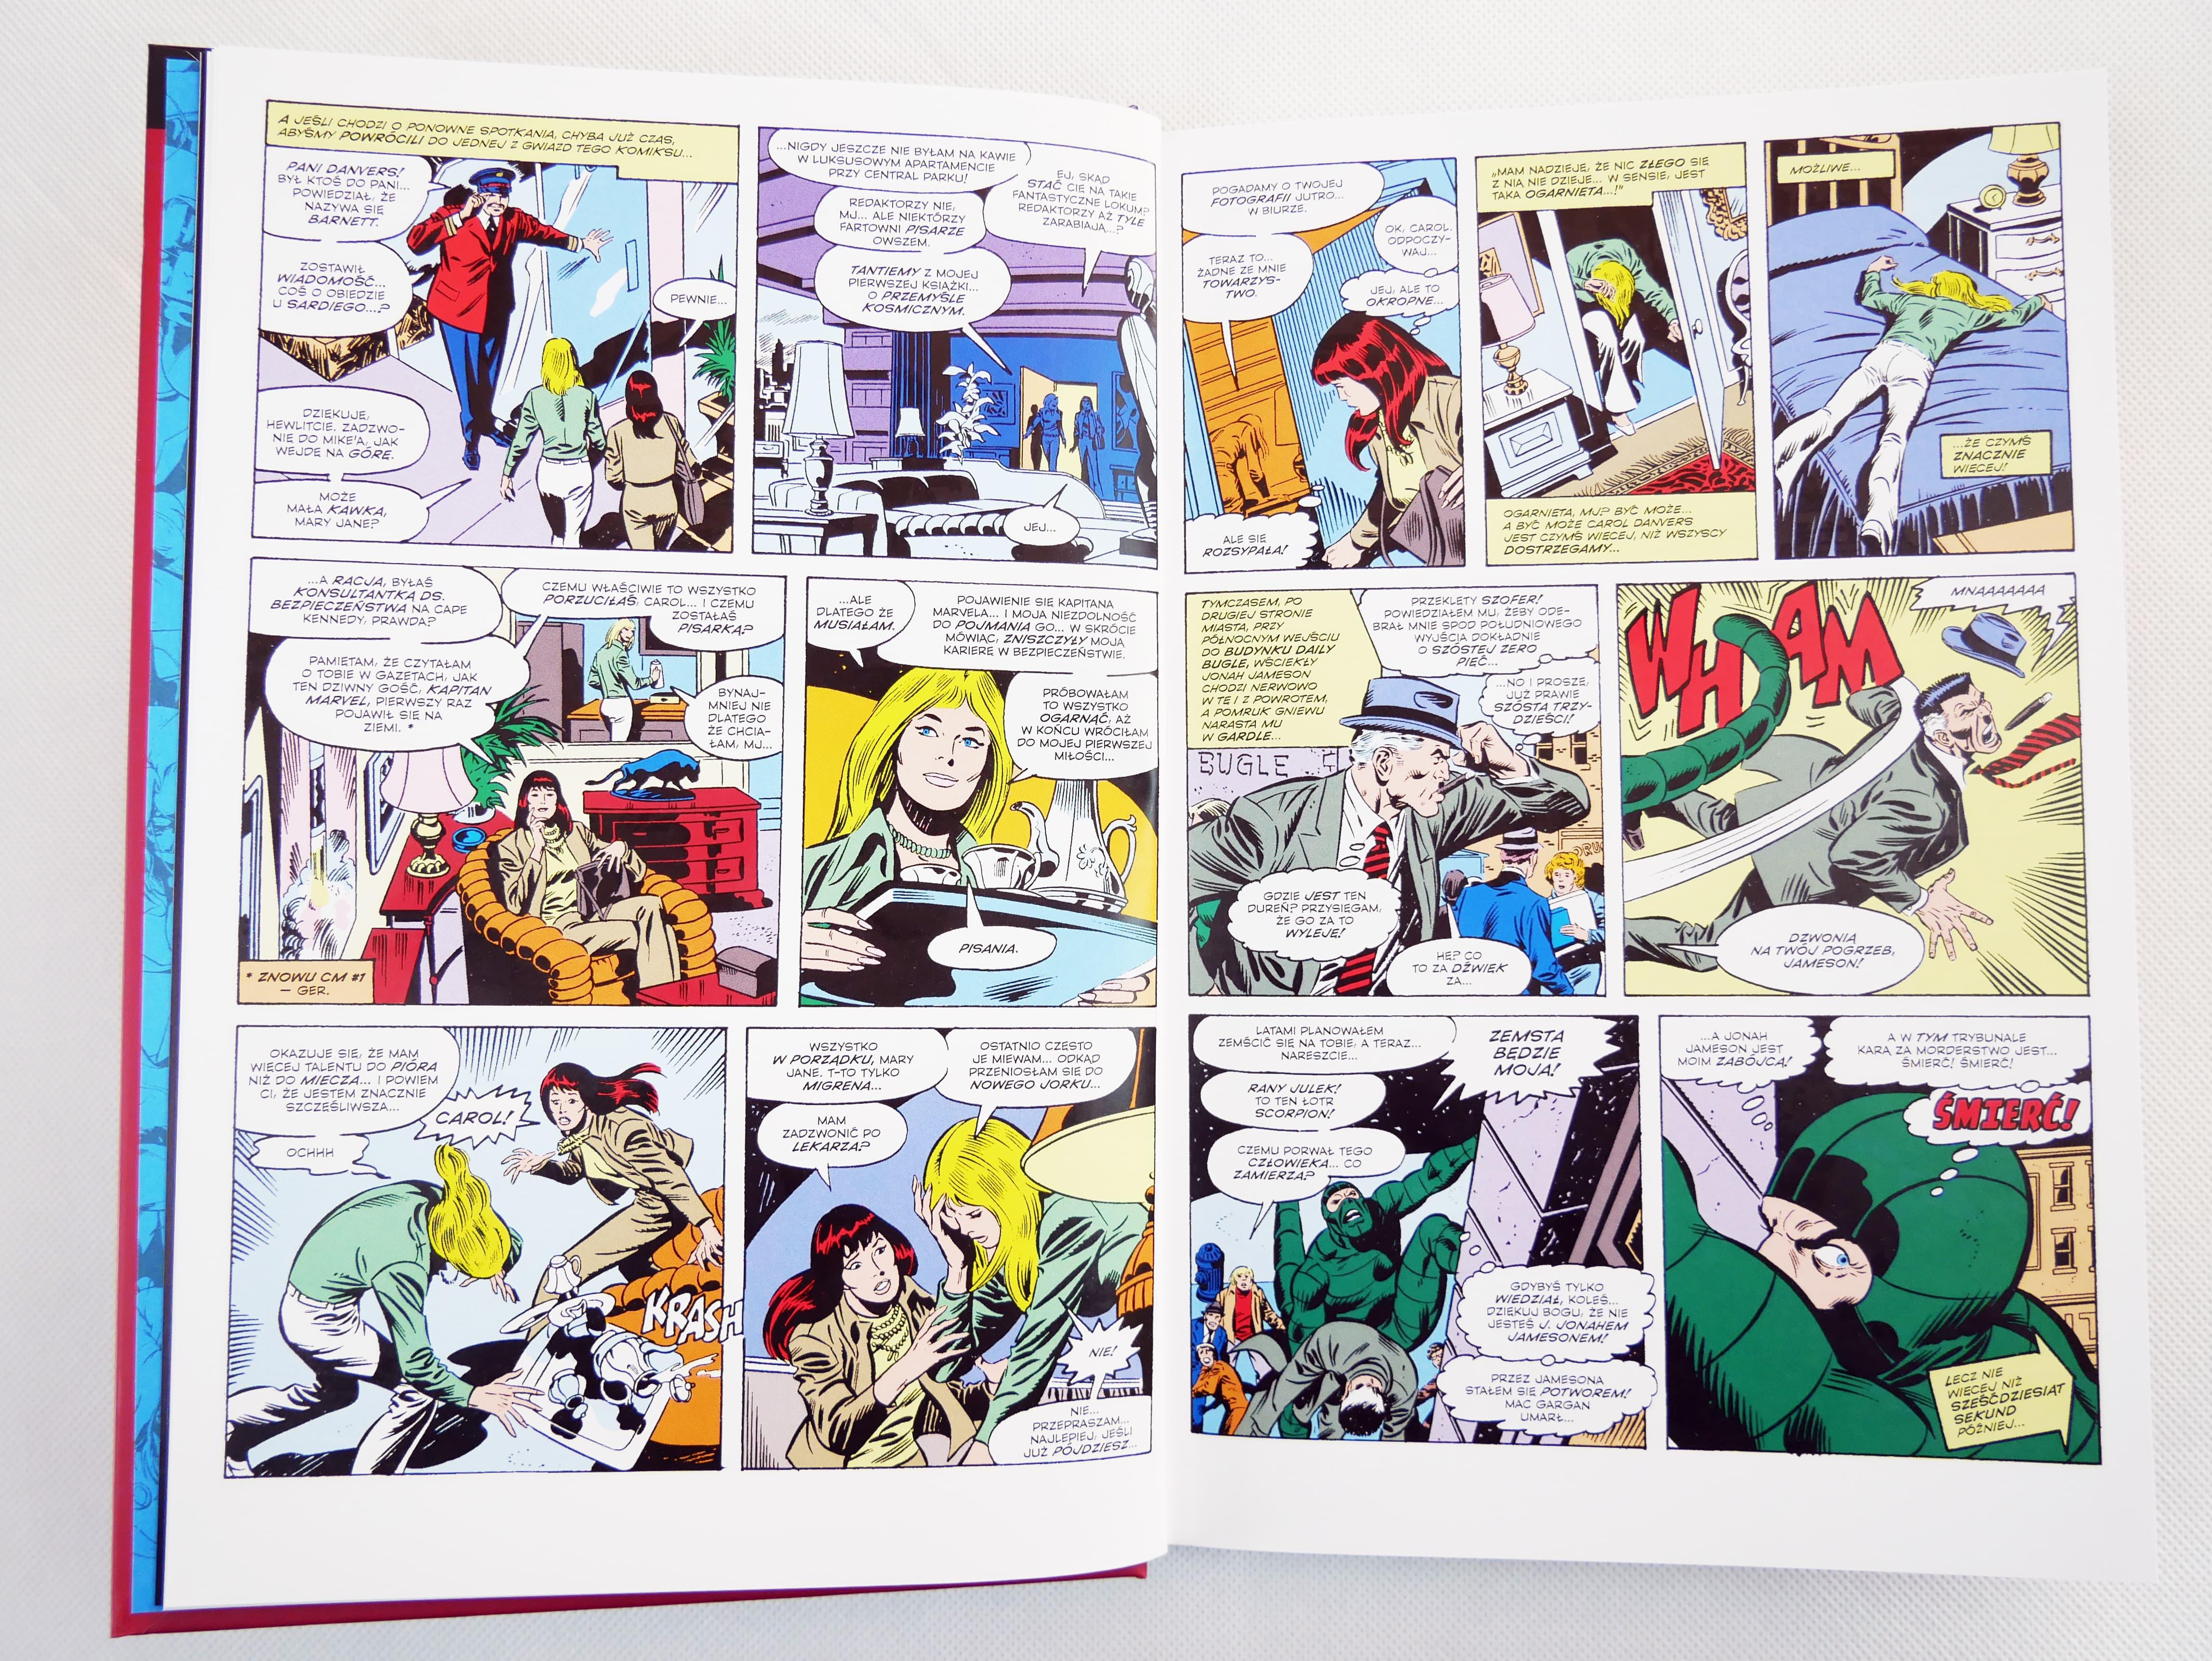 Superbohaterowie Marvela#51: Kapitan Marvel: Carol Danvers